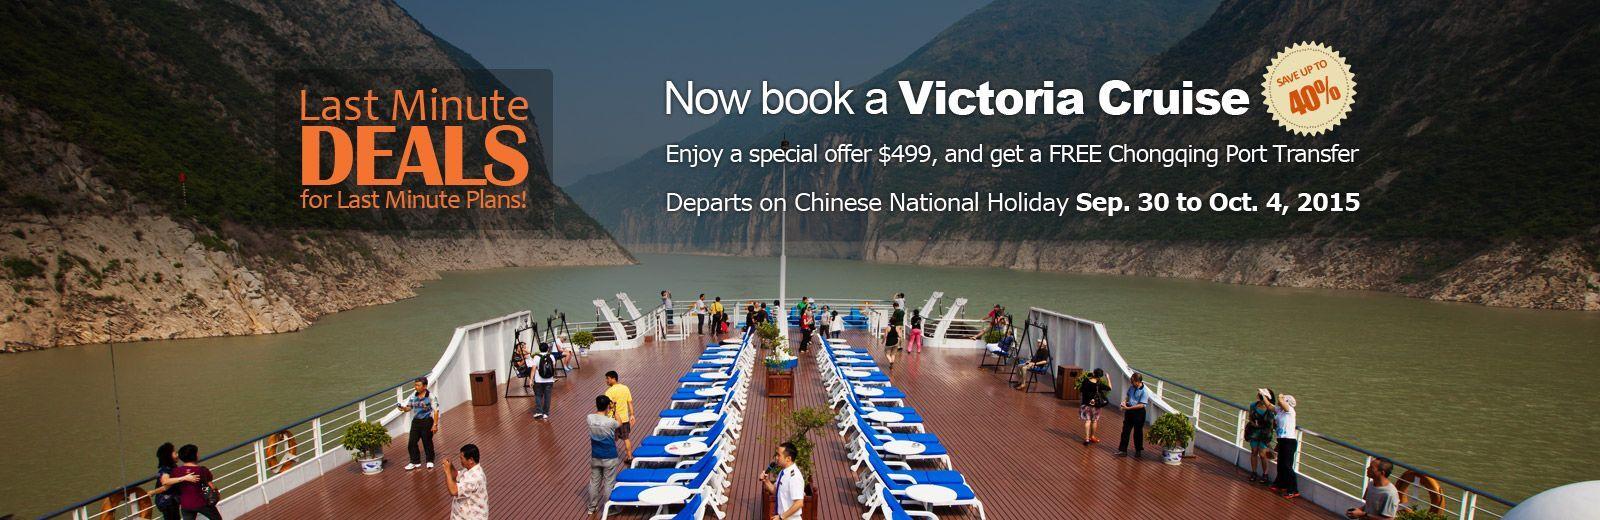 Victoria Cruise Deals